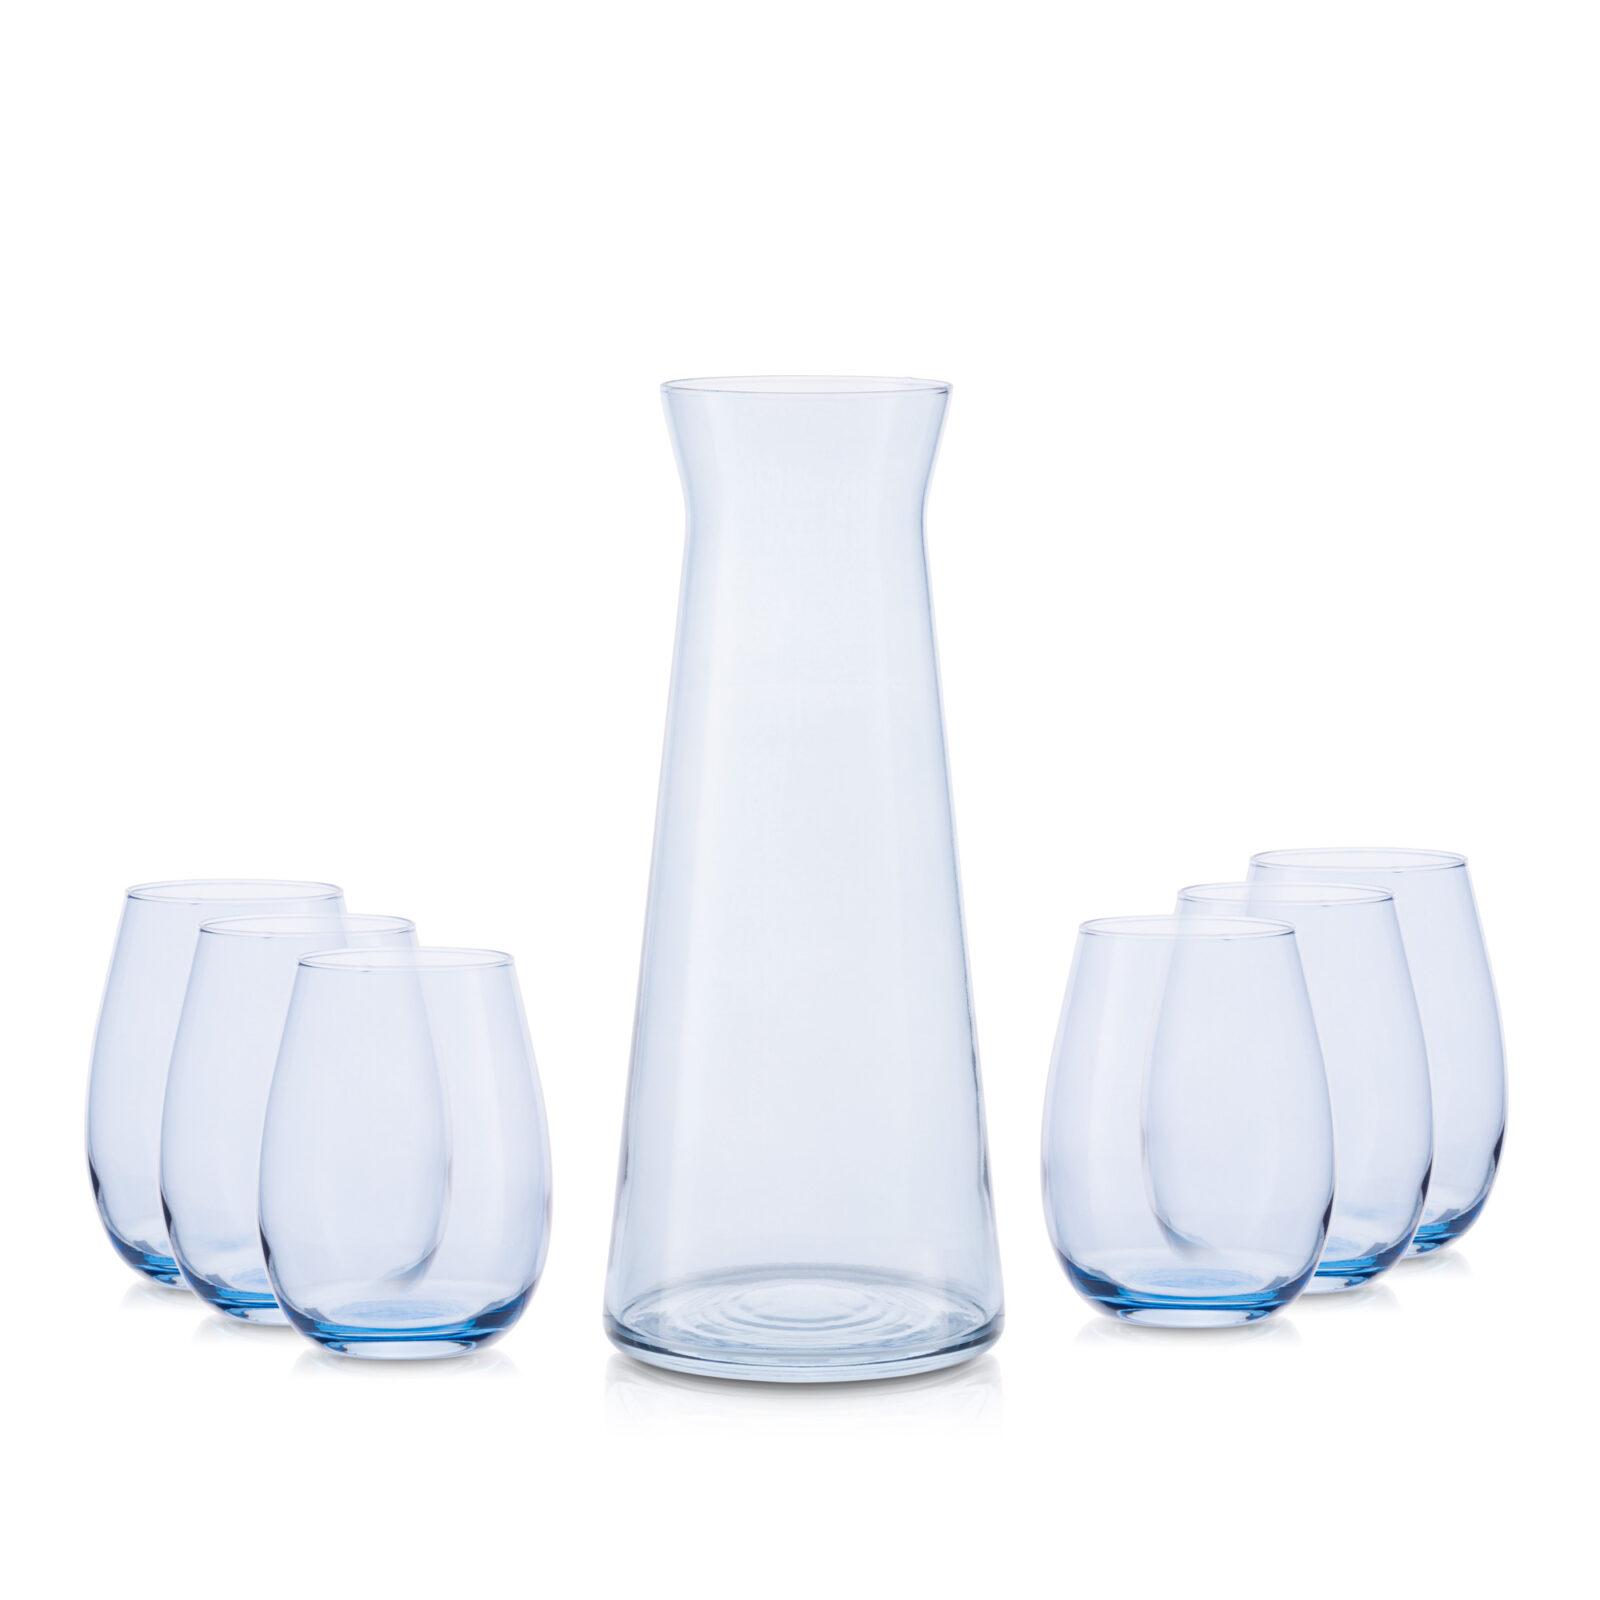 Zestaw karafka 1,1 L+ 6 szklanek niebieski